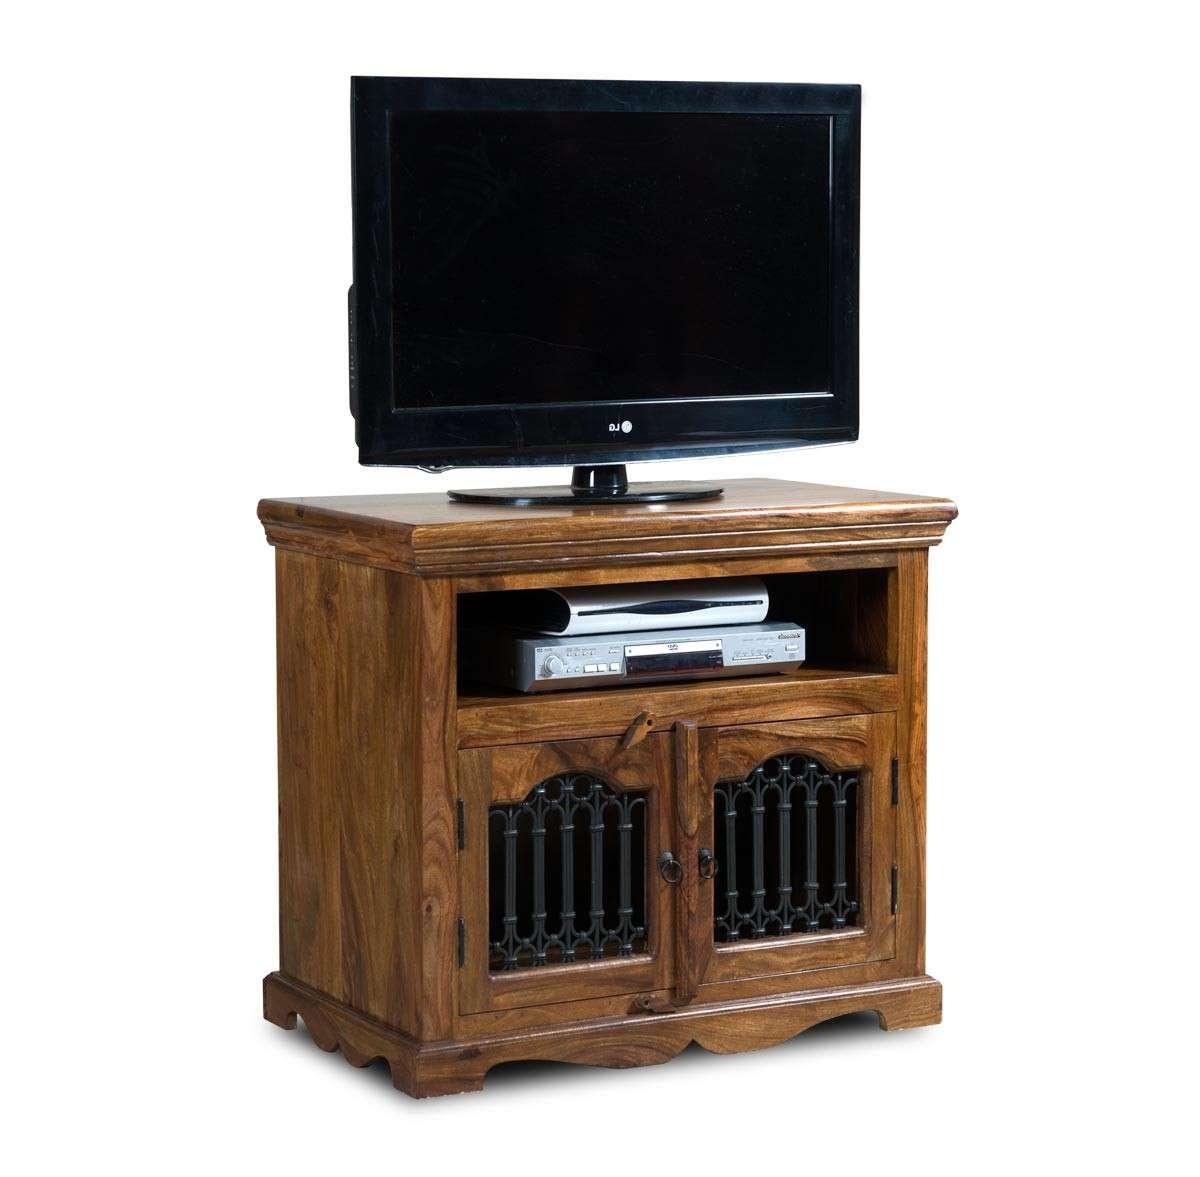 Jali Sheesham Tall Tv Cabinet | Casa Bella Furniture Uk Regarding Jali Tv Cabinets (View 17 of 20)